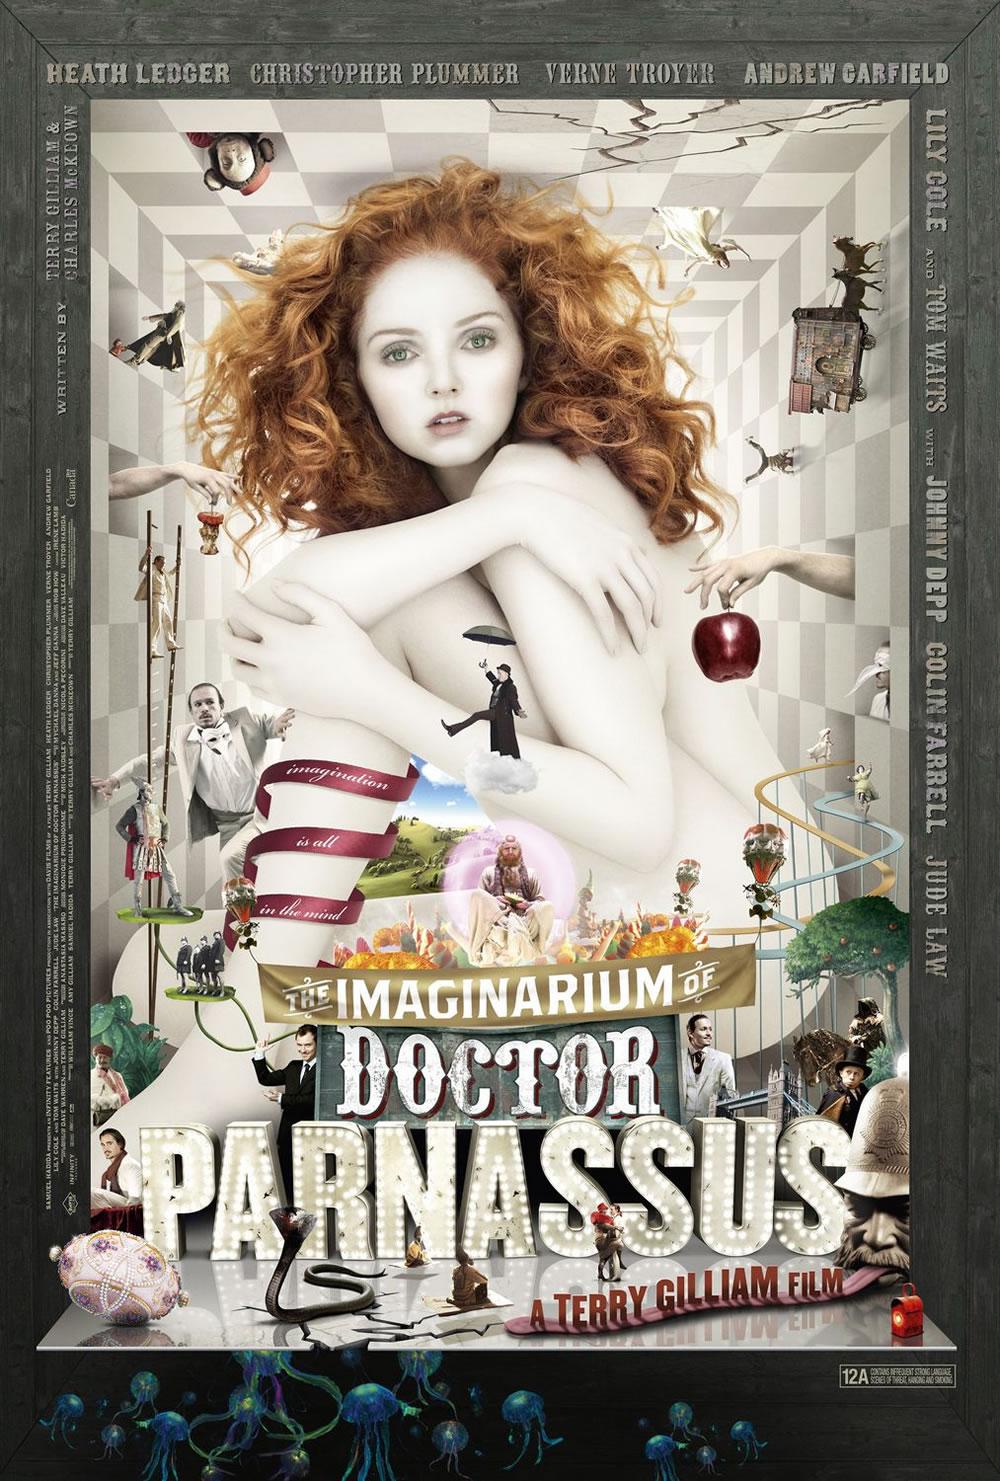 http://4.bp.blogspot.com/_apry_KKq-eU/SxRpGjl_LyI/AAAAAAAAD4M/jeEP_bLwFsM/s1600/the-imaginarium-of-doctor-parnassus-movie-poster.jpg